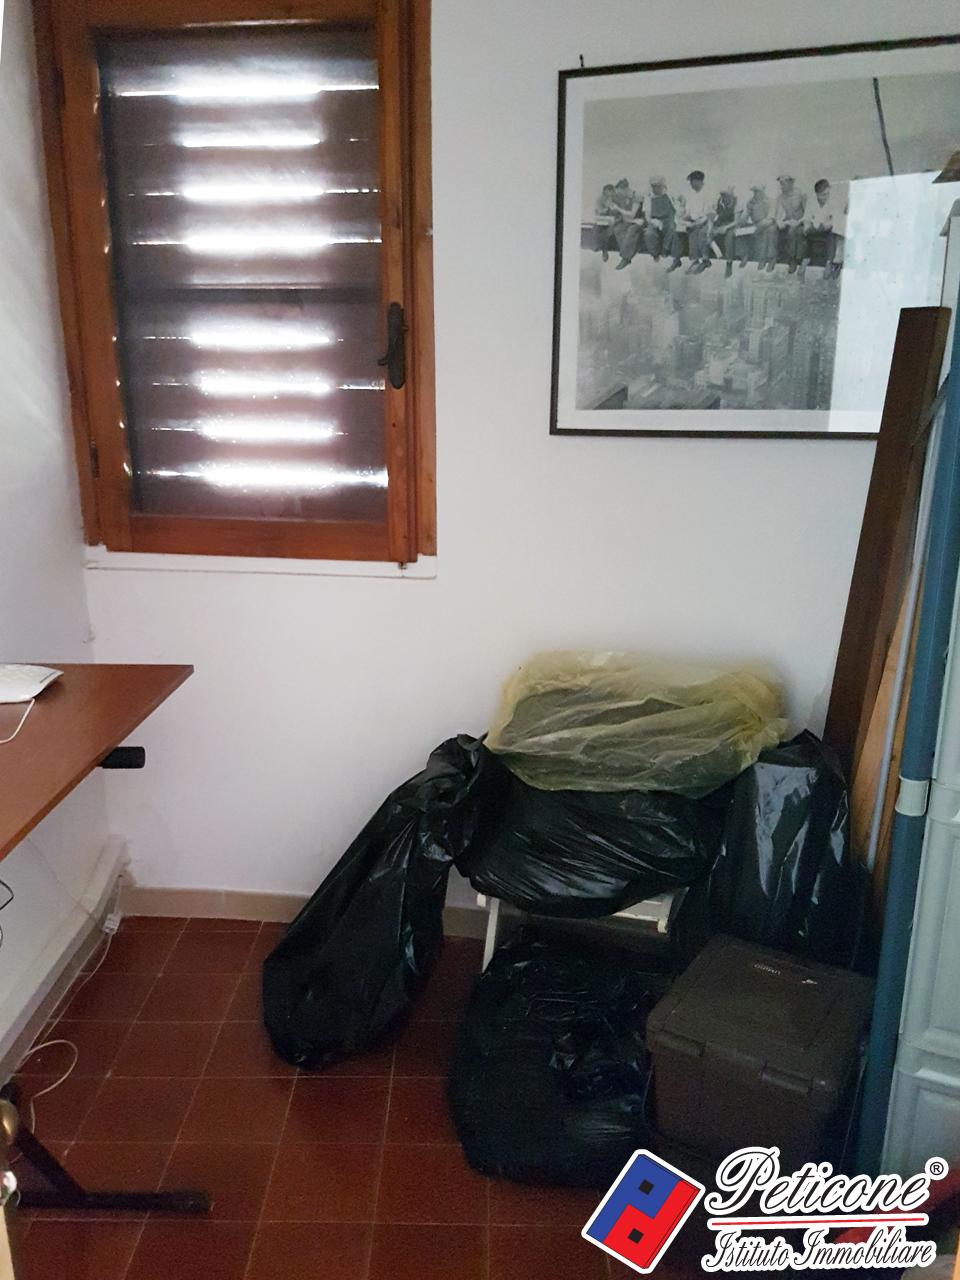 Villa in Vendita a Sperlonga: 4 locali, 90 mq - Foto 14